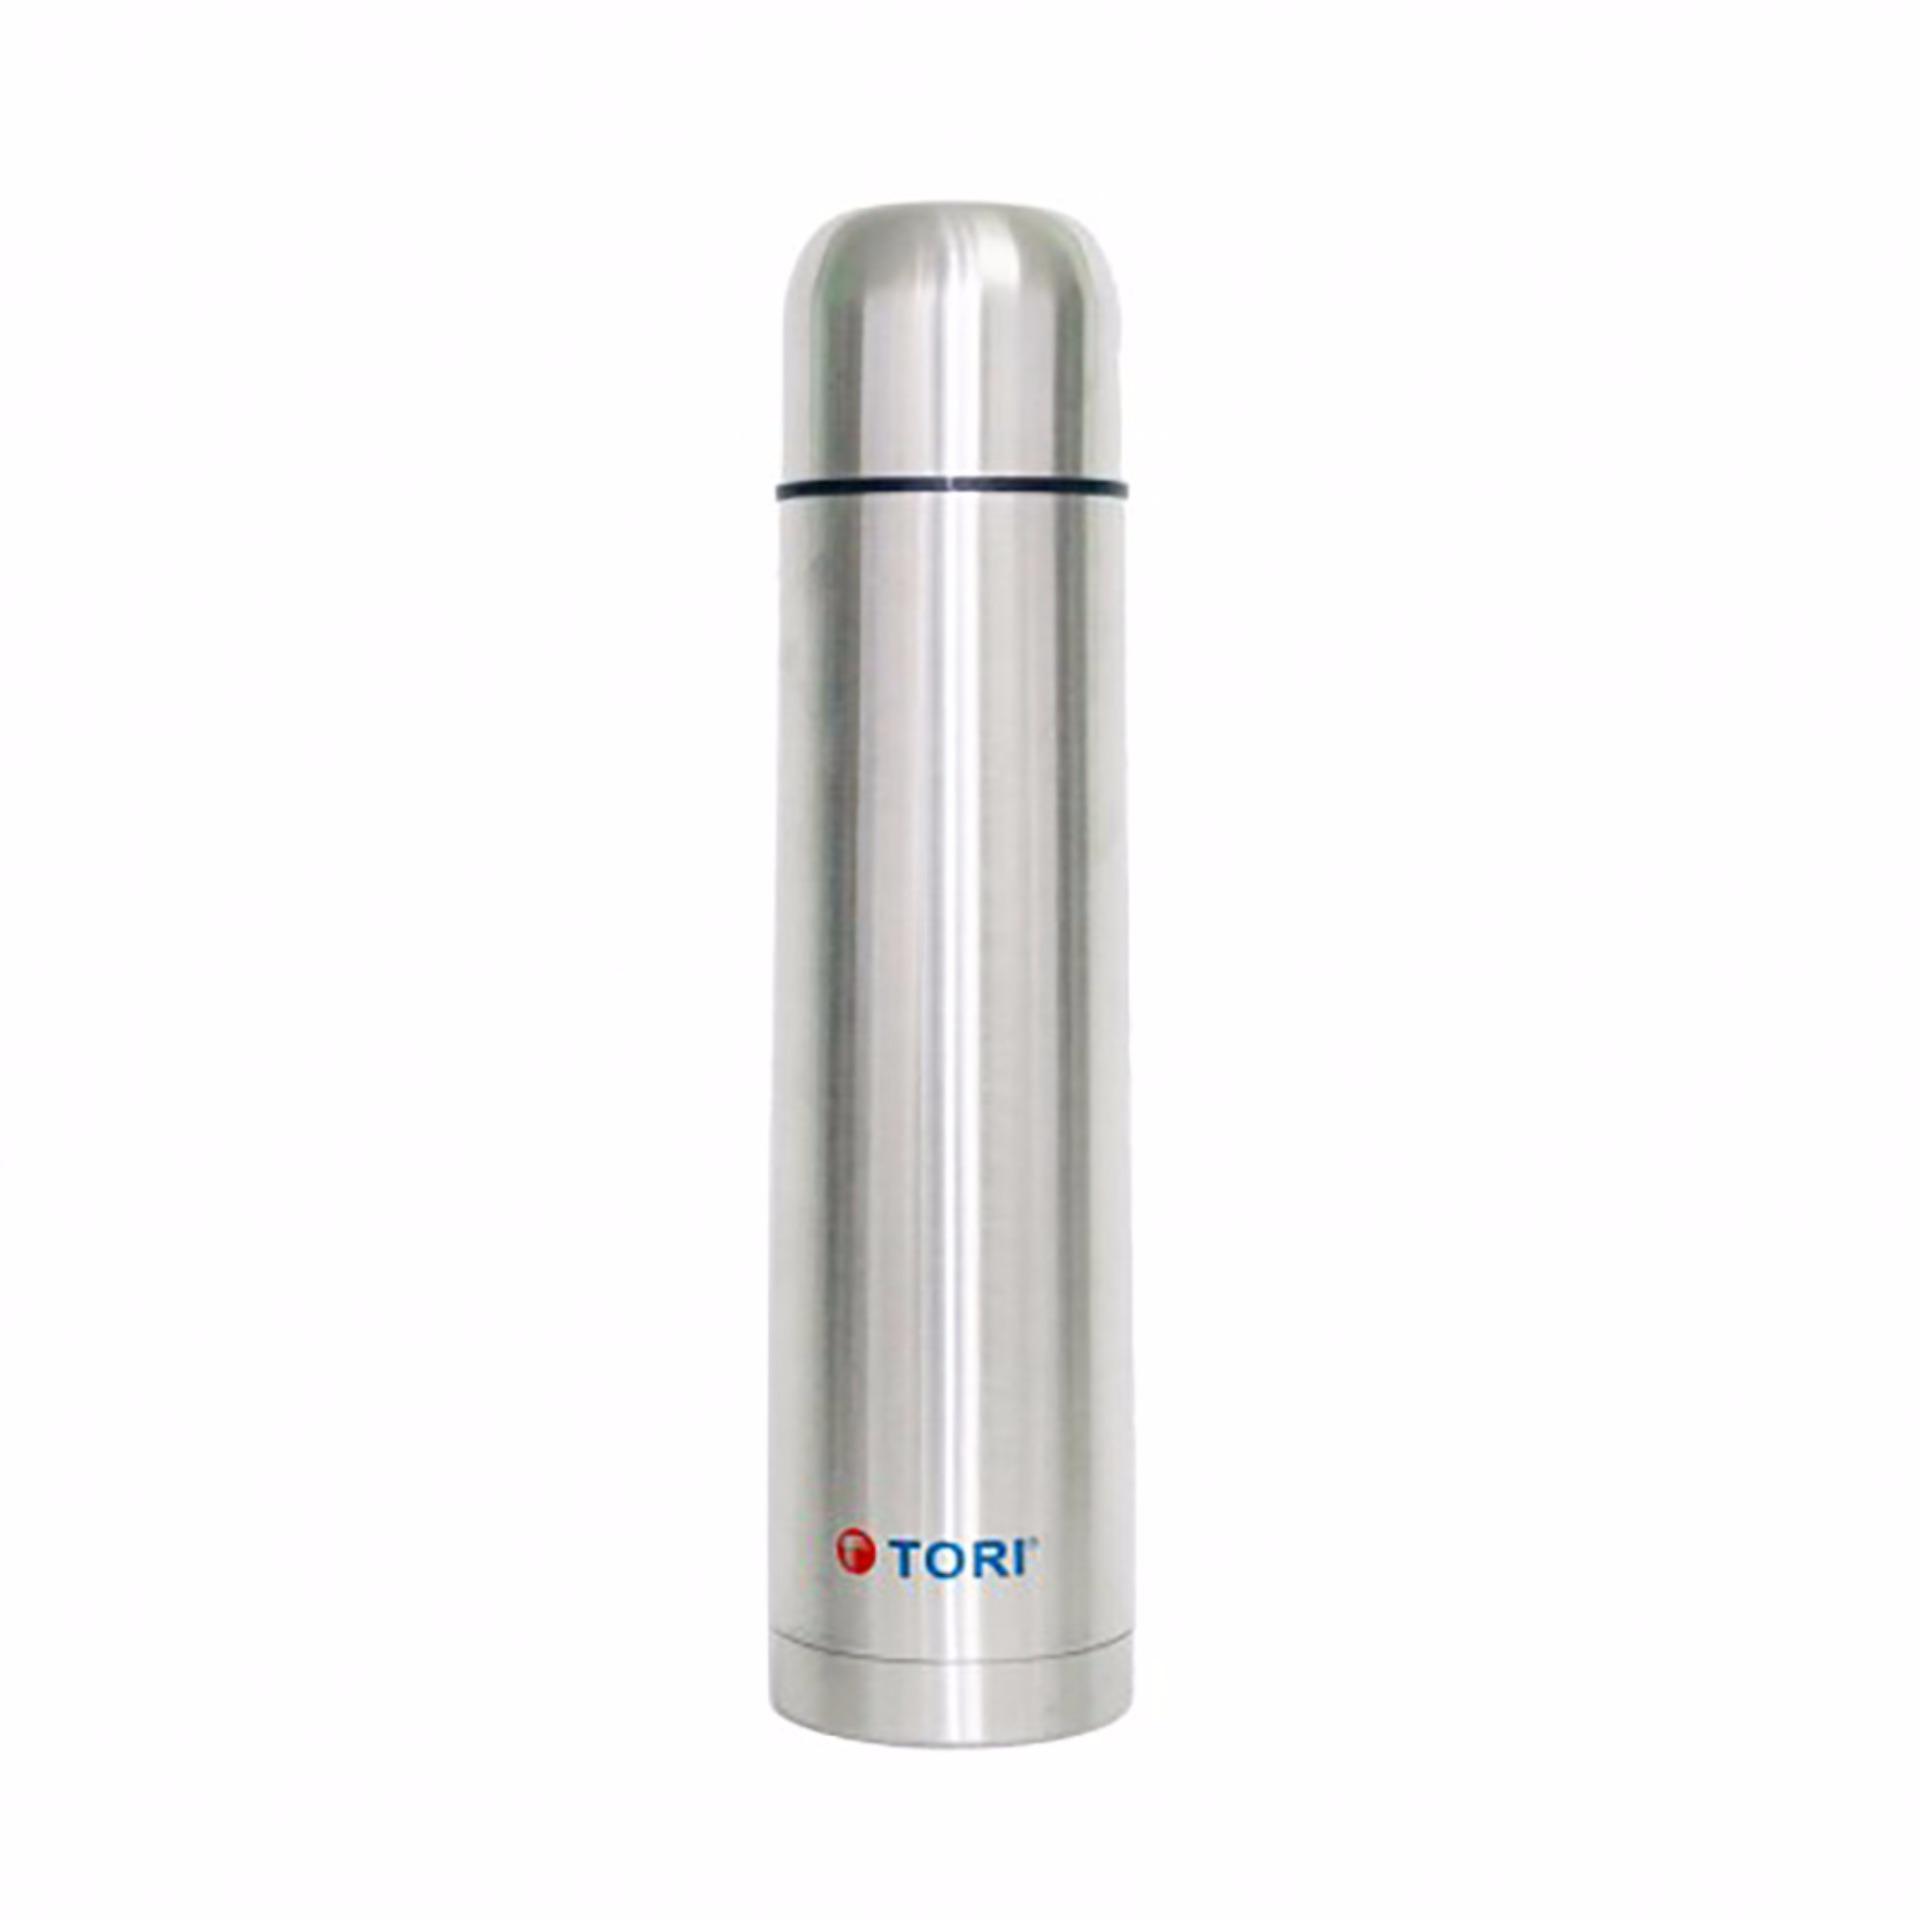 Harga Tori Vacuum Flask Tvf 1000 Online